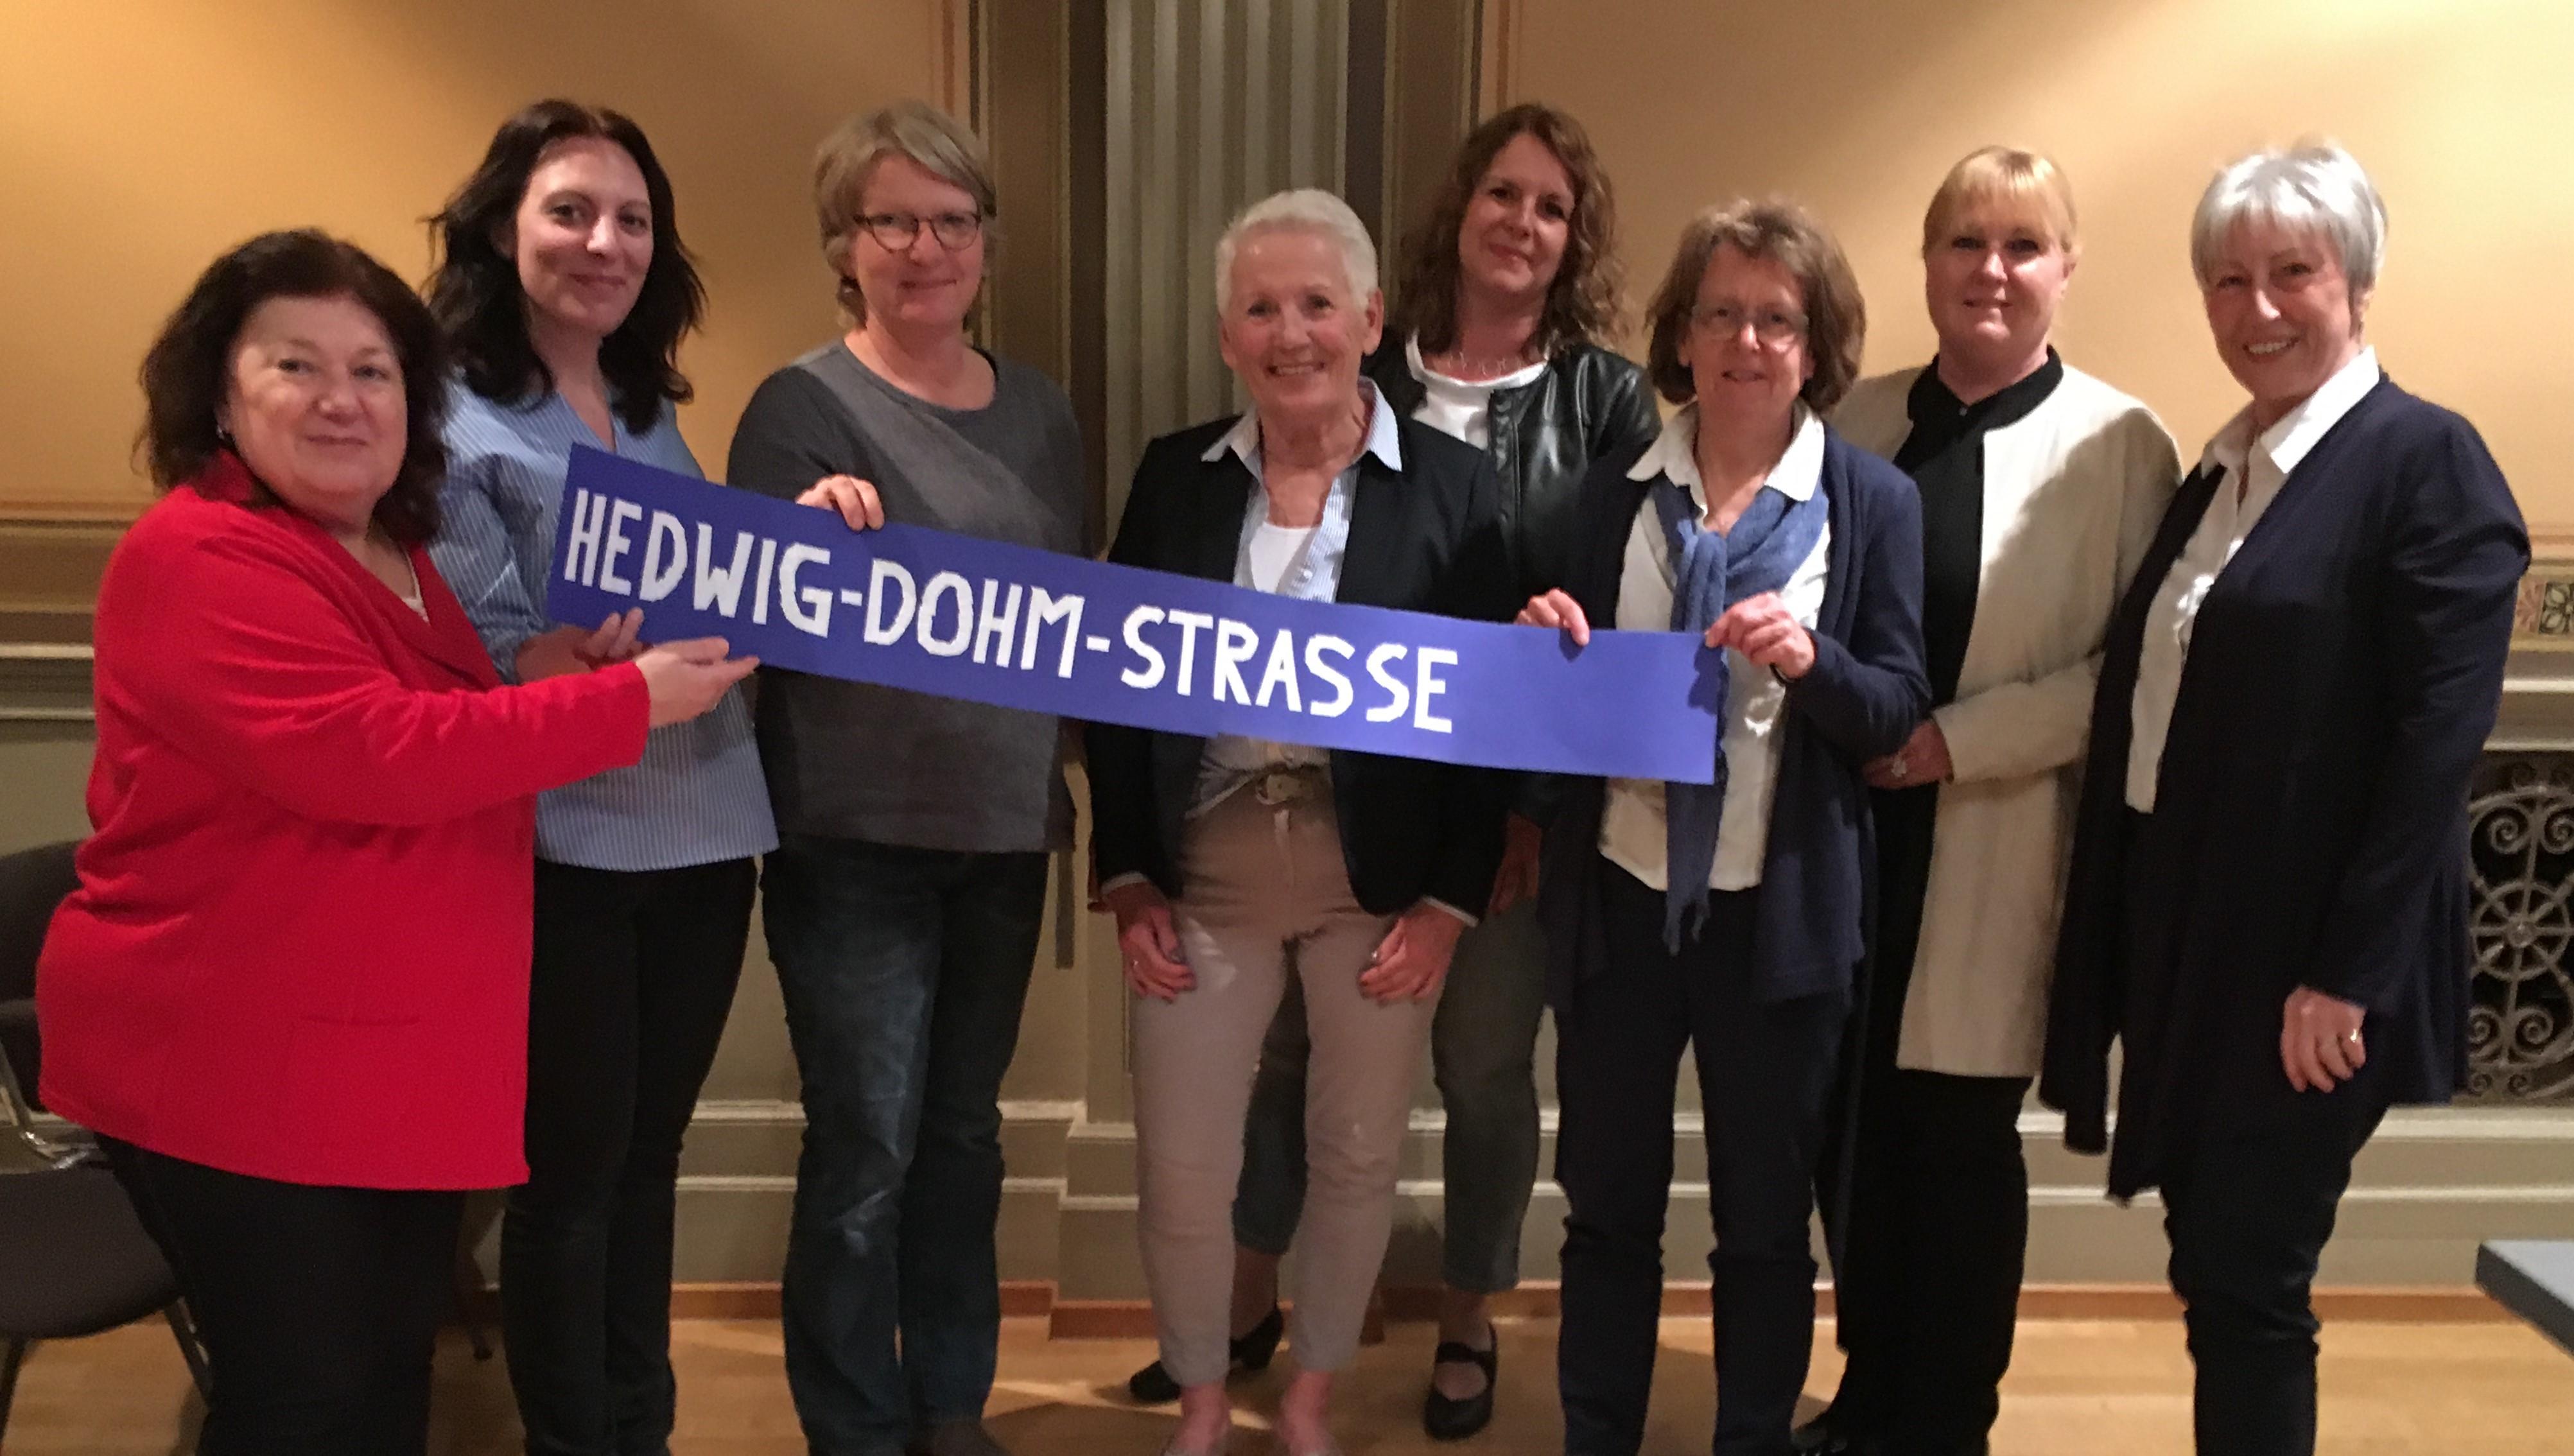 Antrag der Stadträtinnen zur HEDWIG-DOHM-STRAßE beschlossen